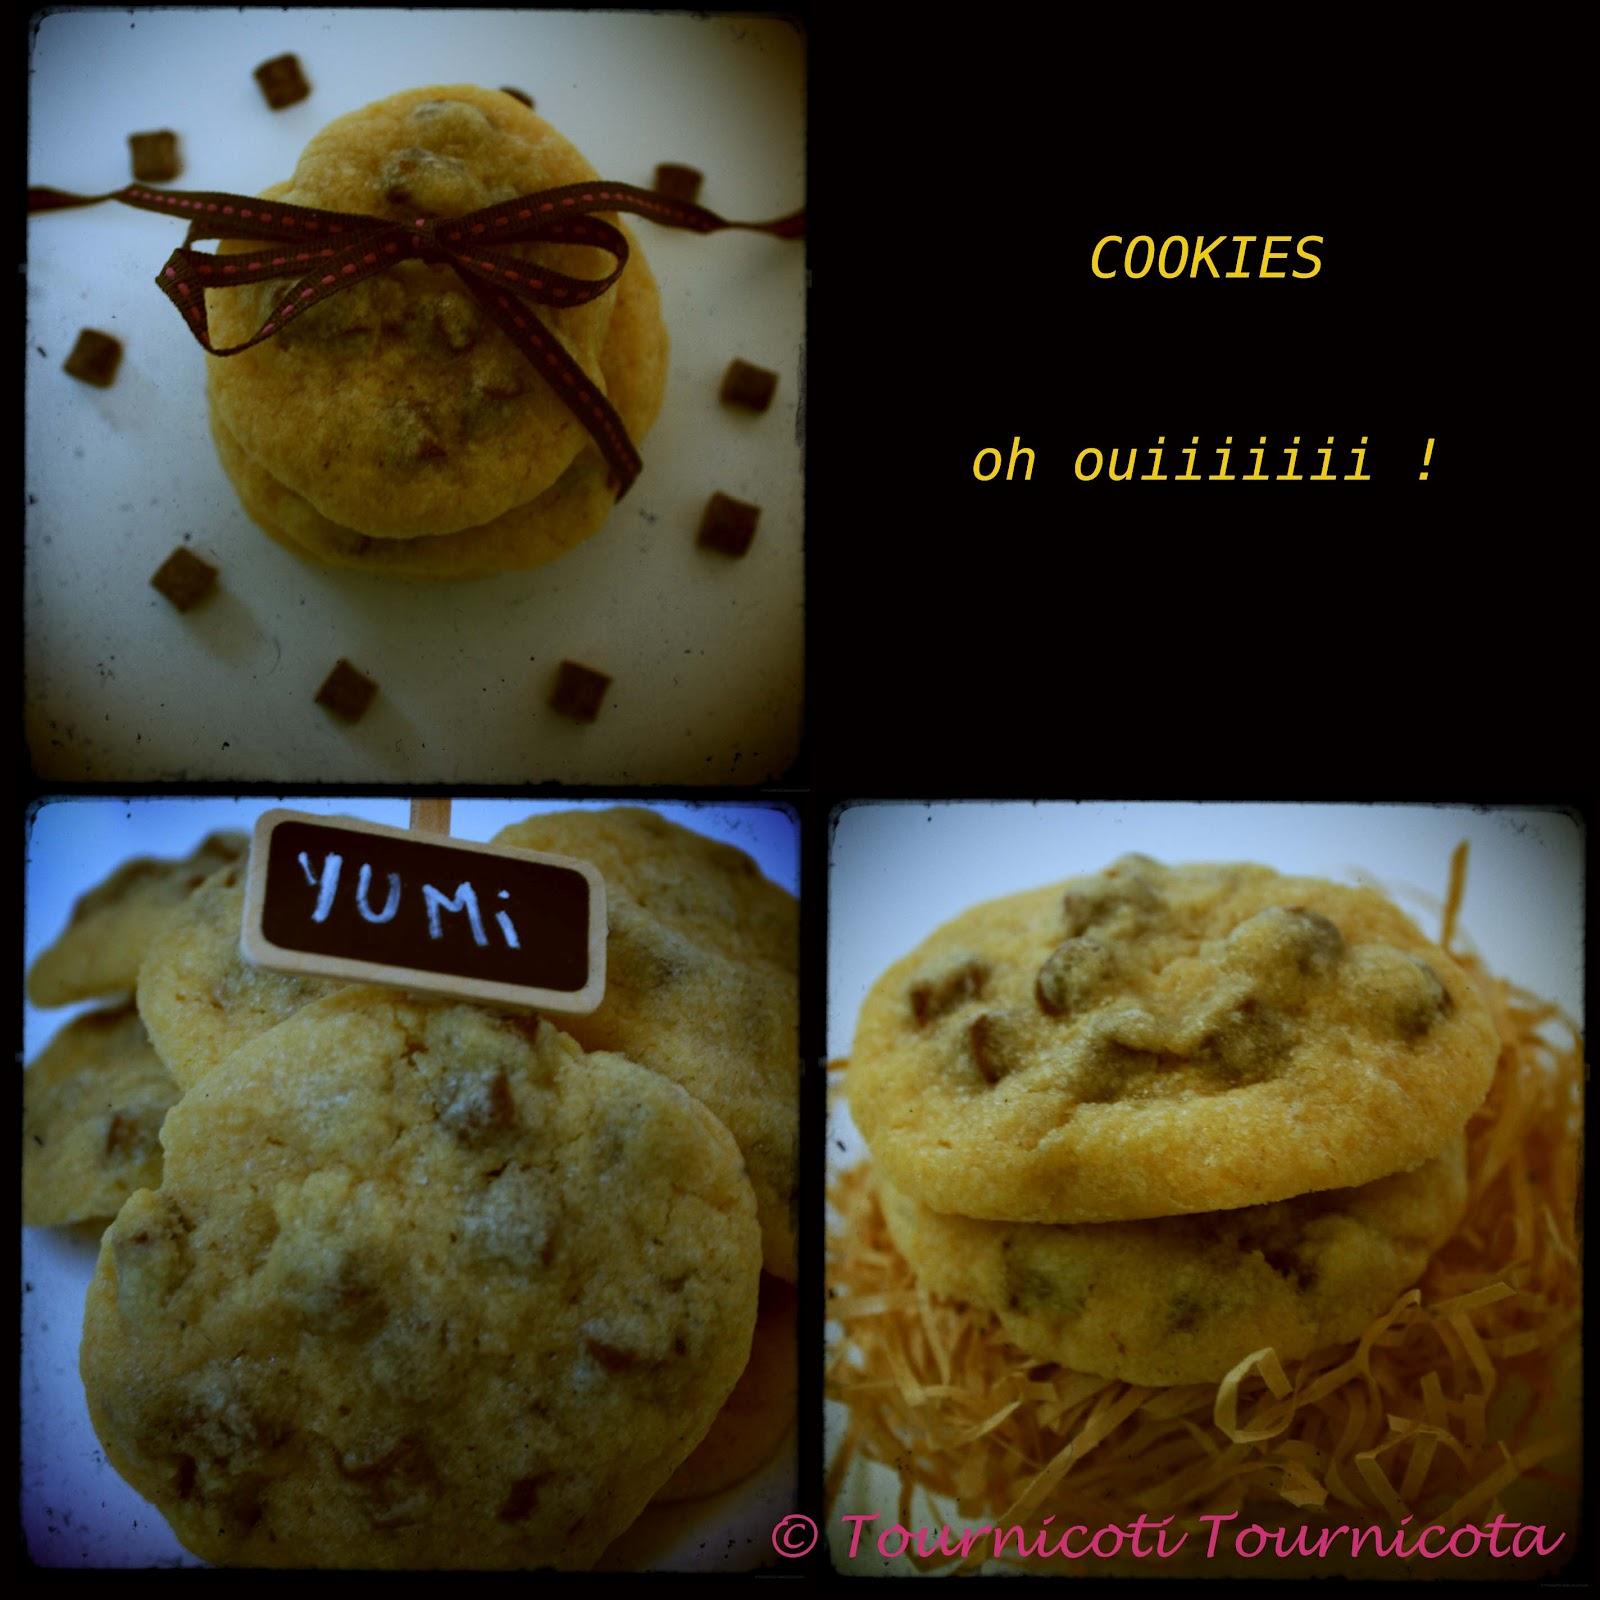 Tournicoti tournicota the cookies la recette de laura todd - Recette cookies laura todd ...